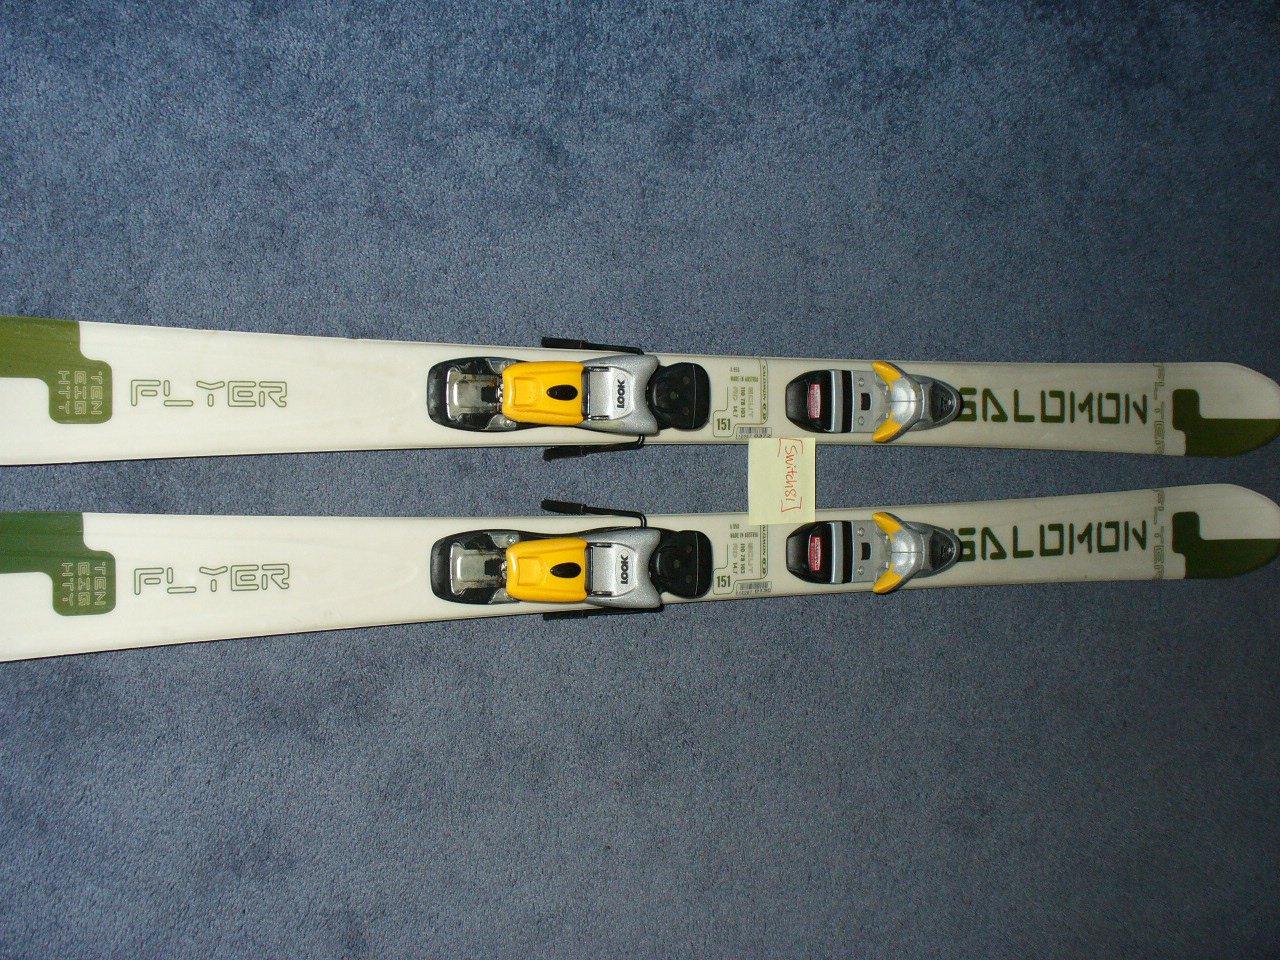 Ski equip - 7 of 7